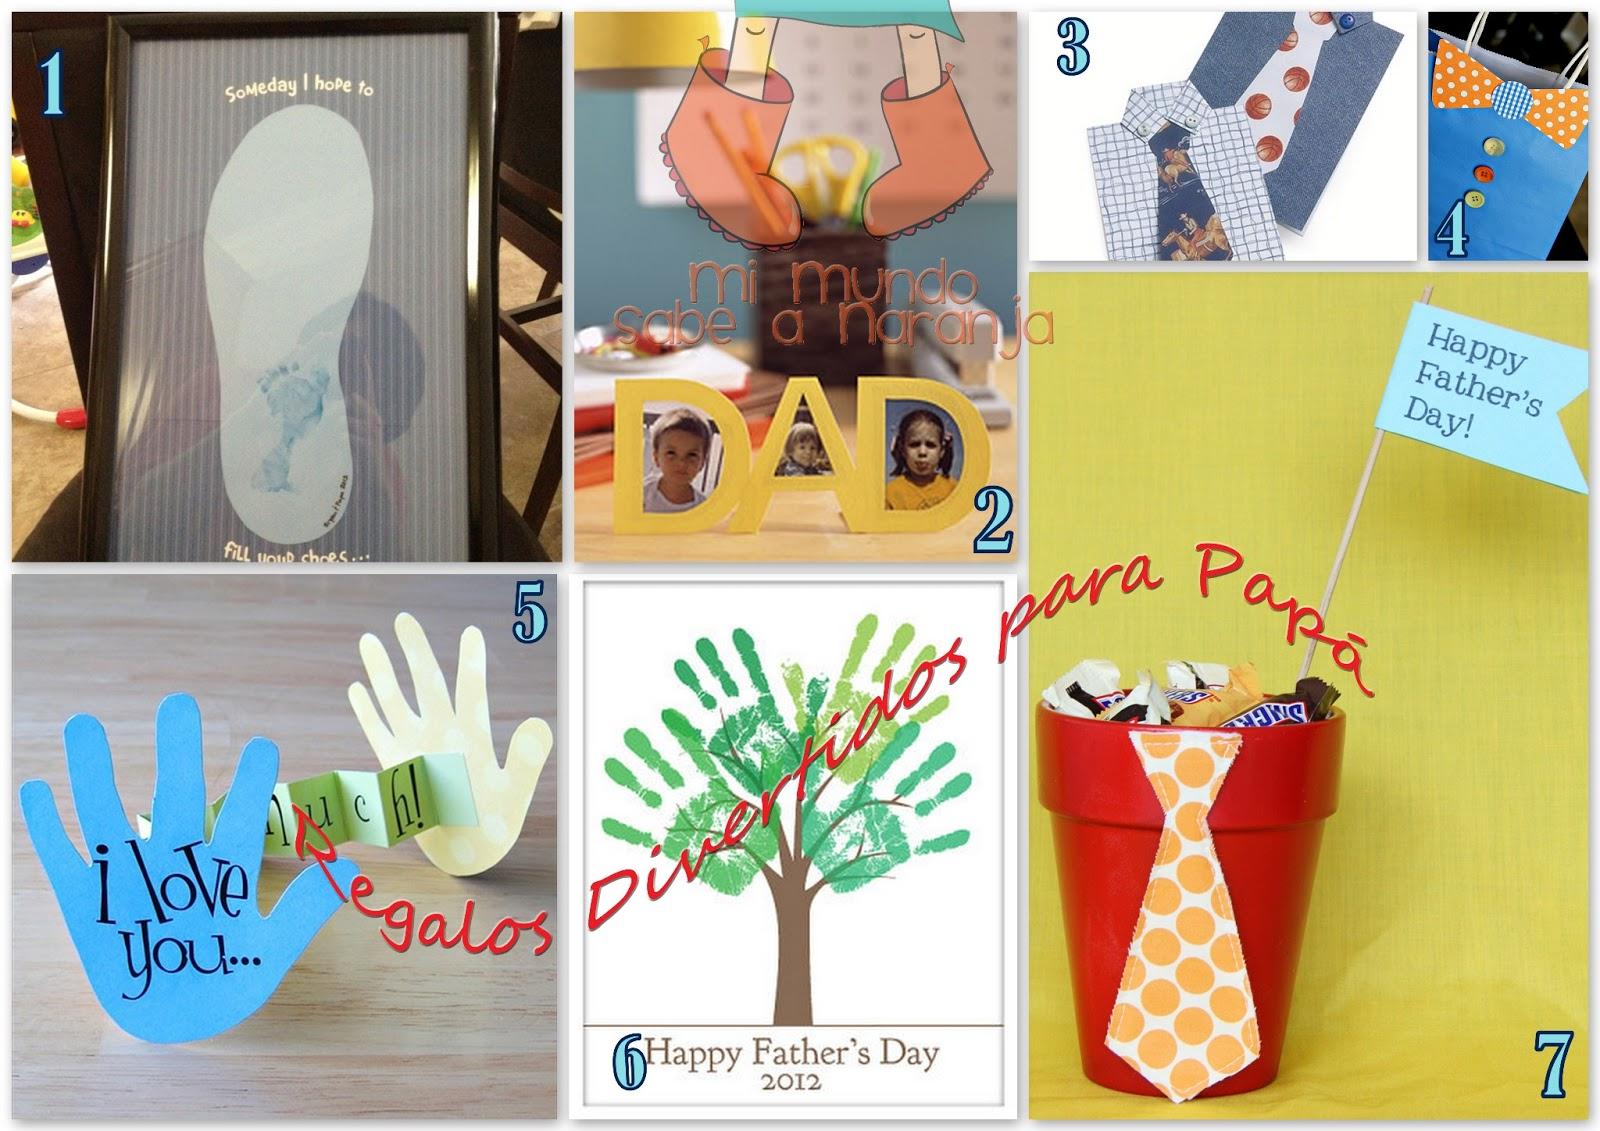 Mi mundo sabe a naranja diy ideas para el d a del padre - Ideas regalos para padres ...